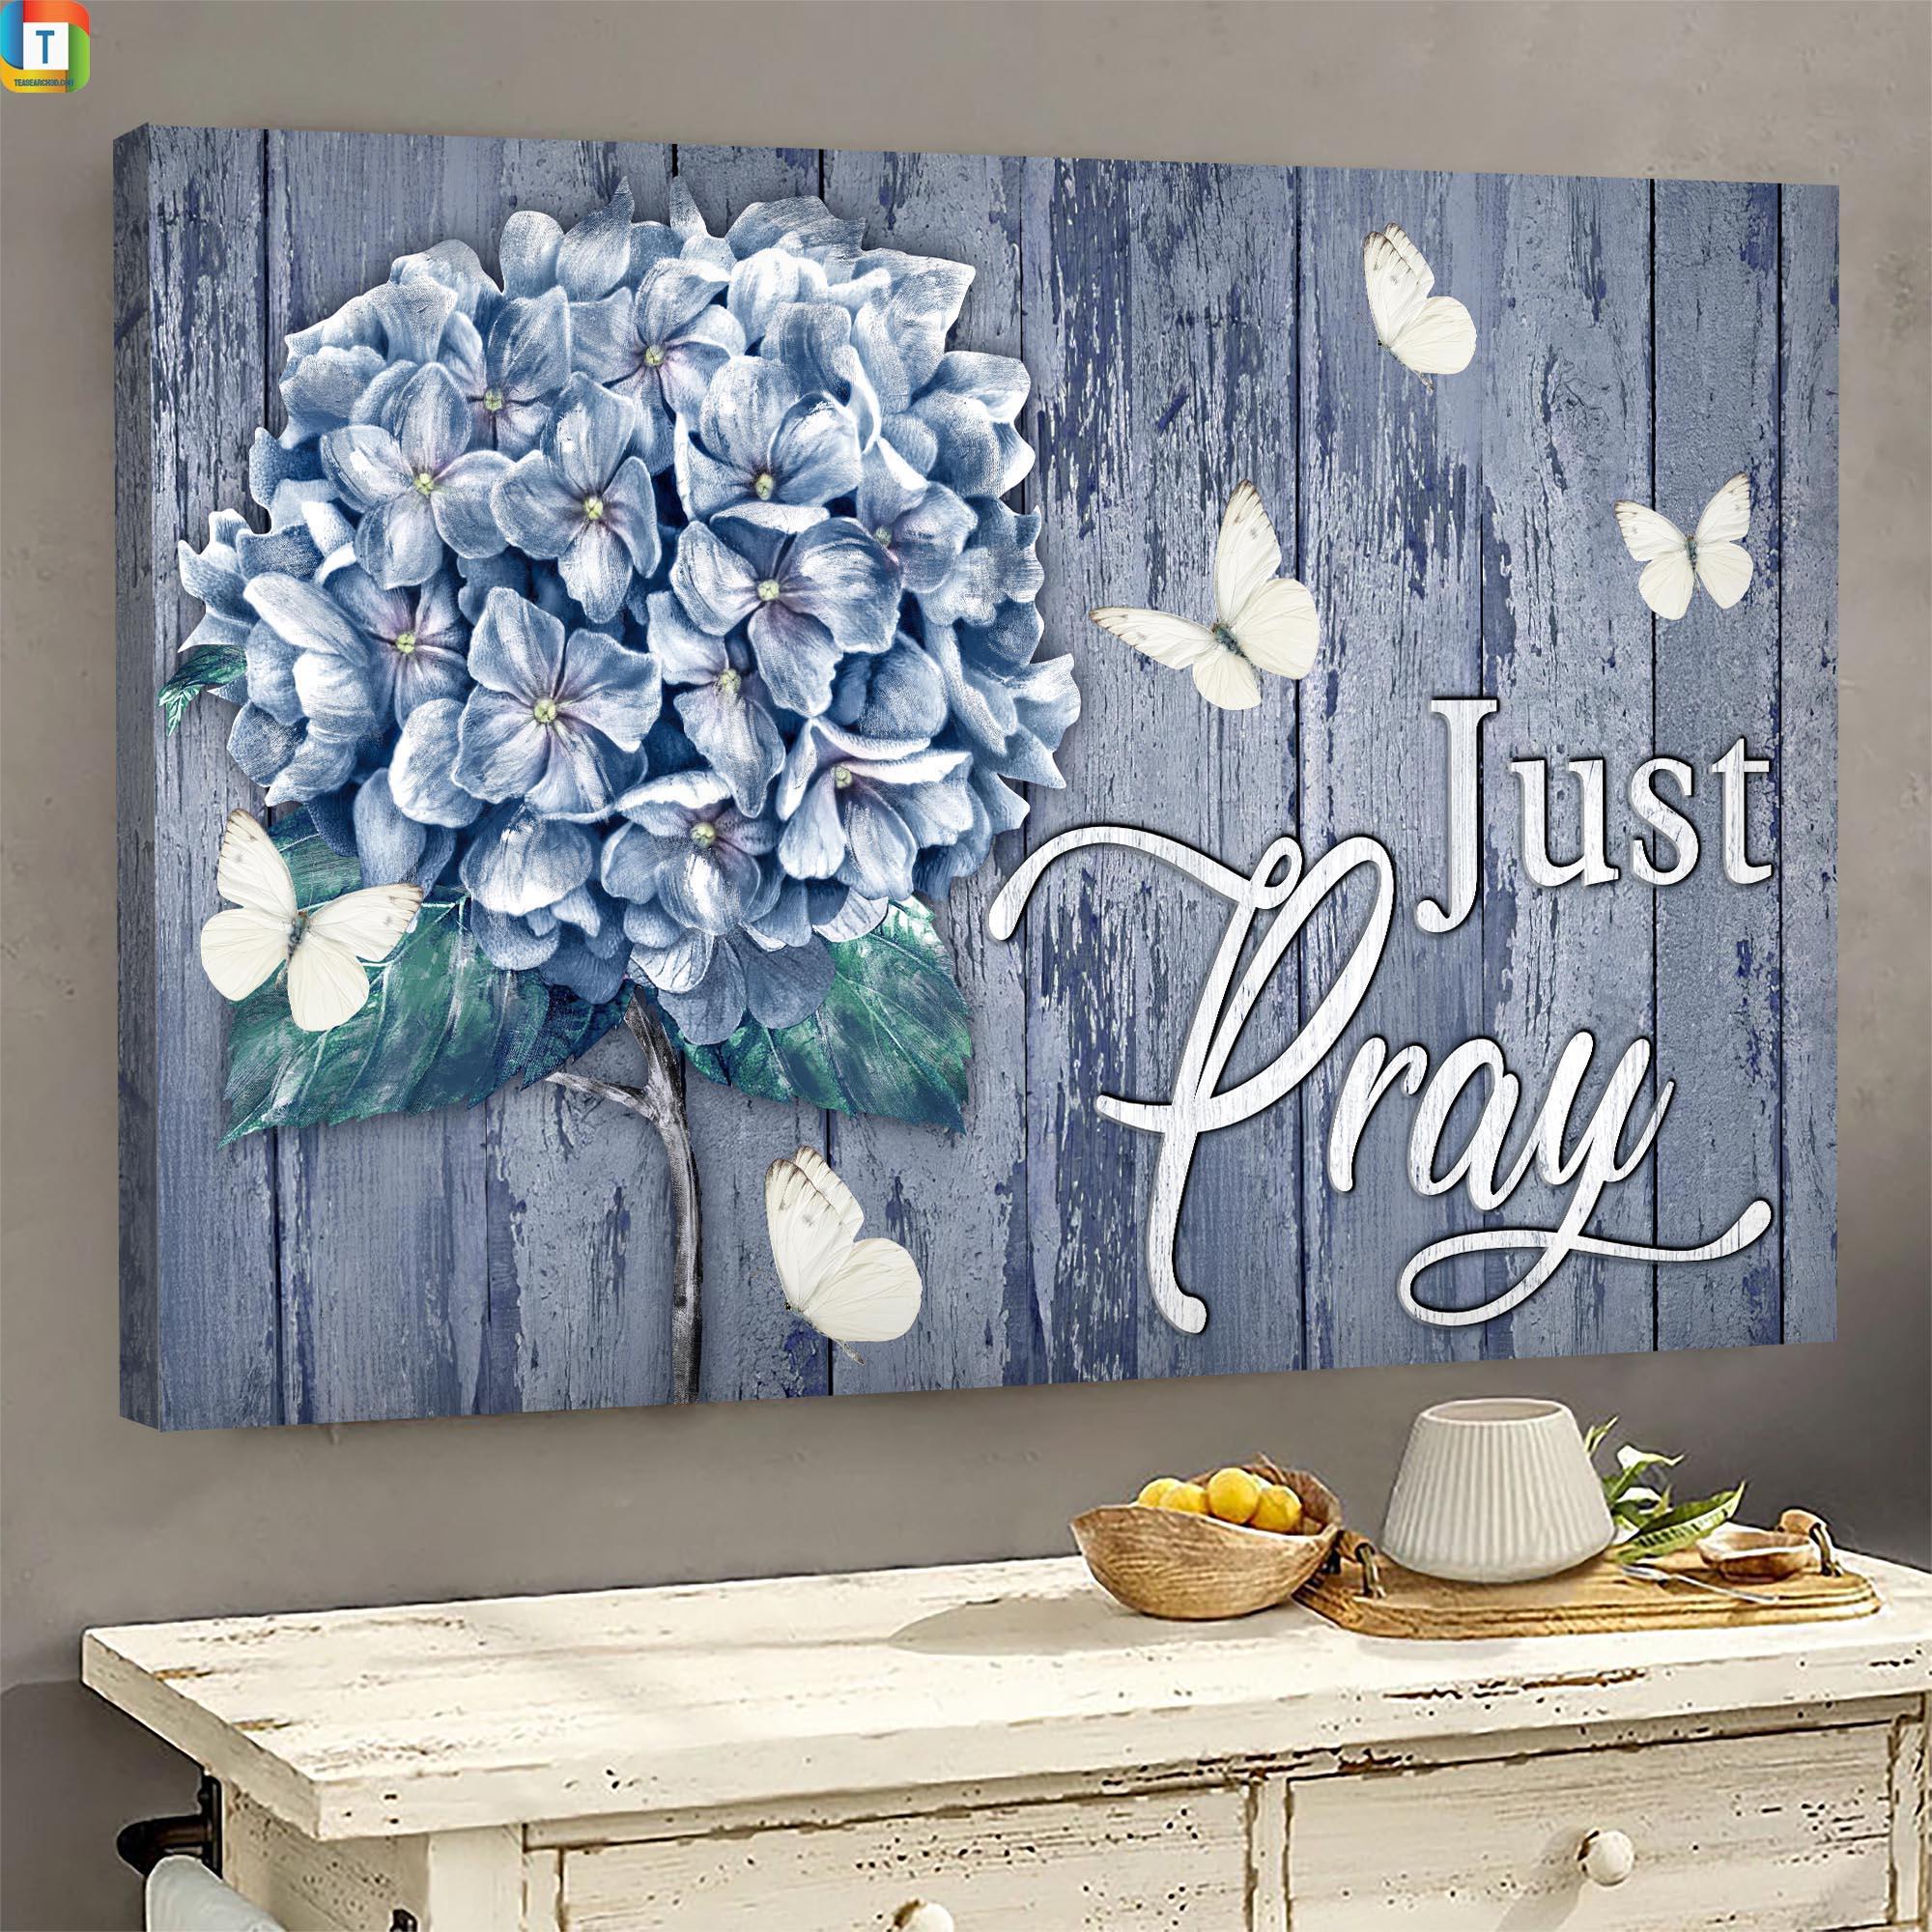 Jesus - Hydrangea - Just pray - Landscape Canvas Print - Wall Art